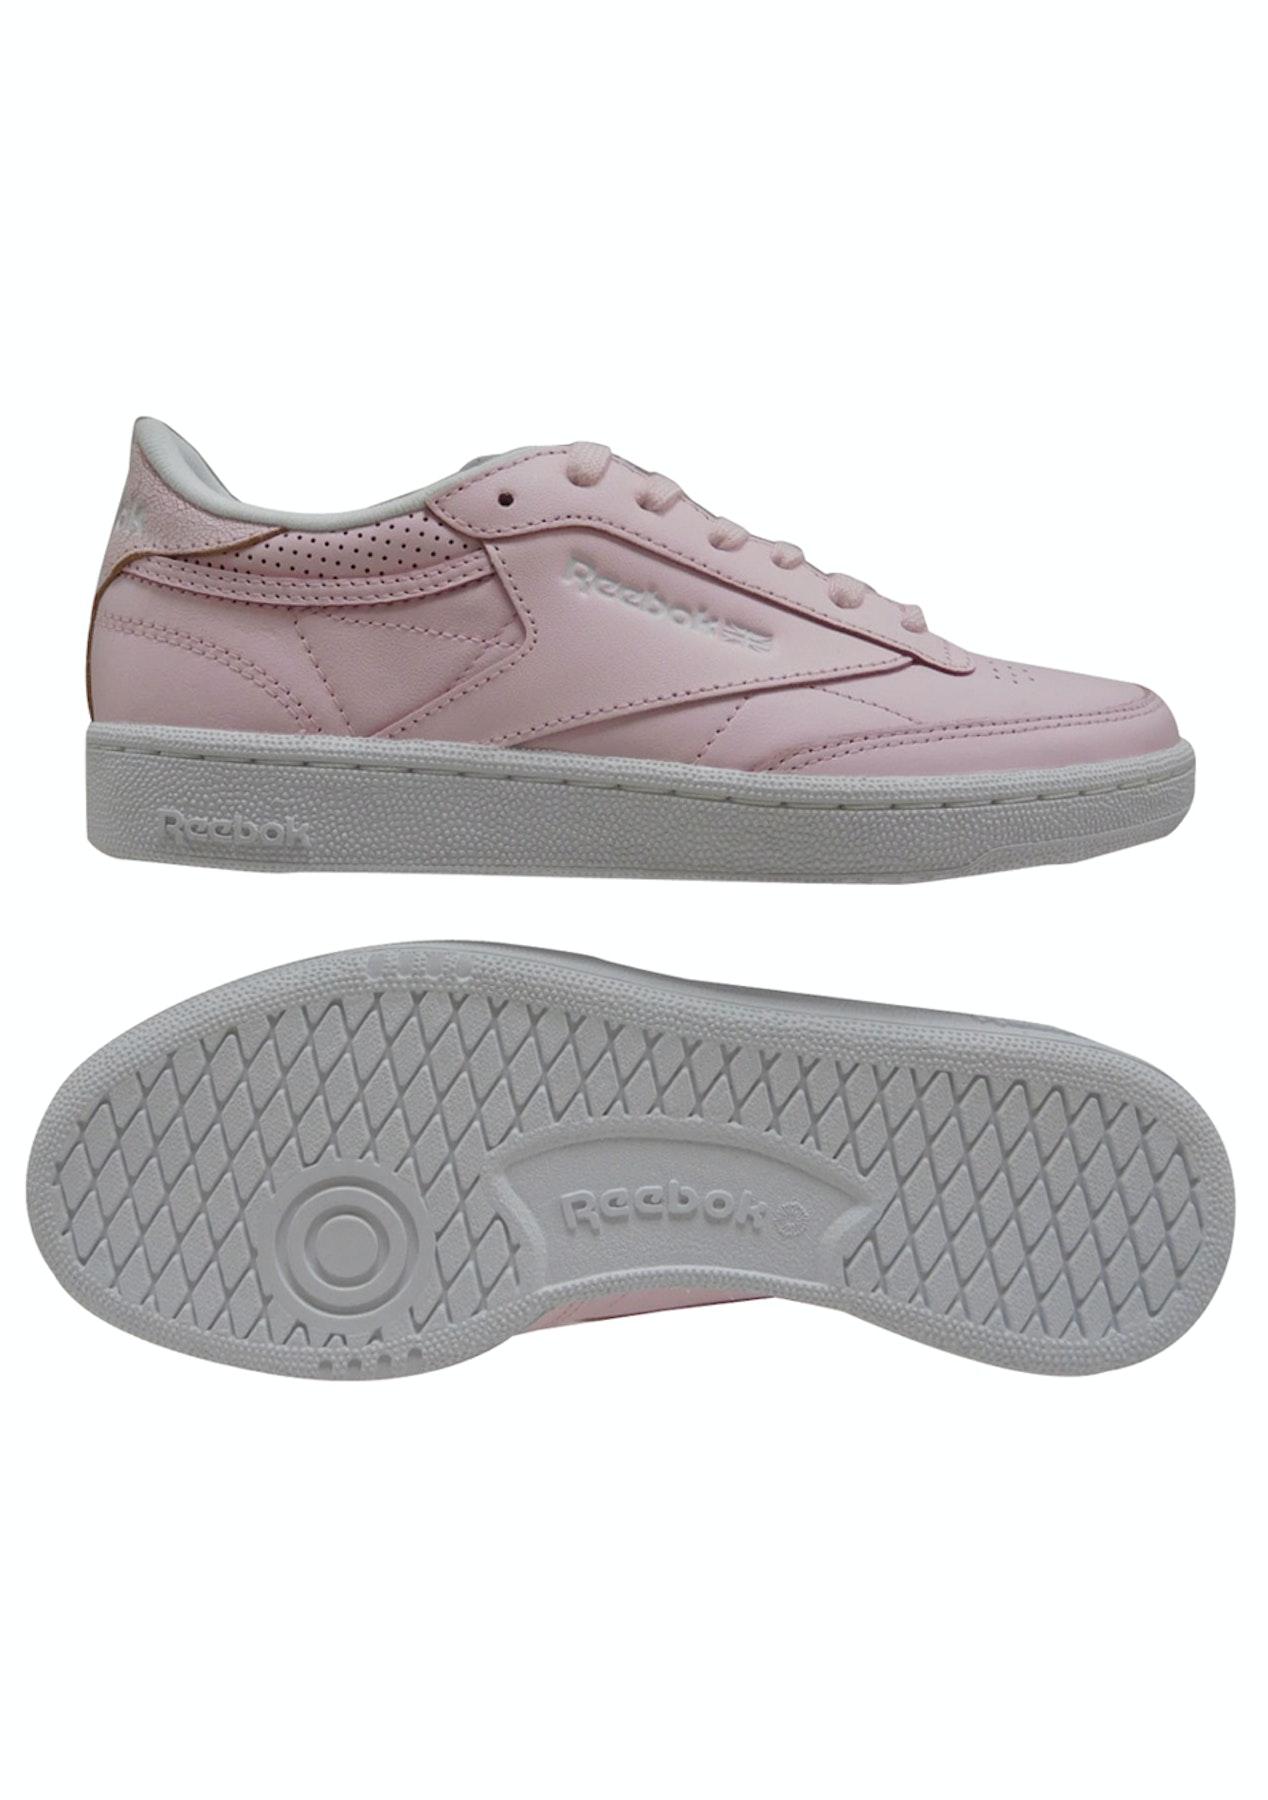 Reebok Womens - Club C 85 Fbt - Pink Wht Silver Skul - 50% off Reebok -  Onceit b28bdf1b3